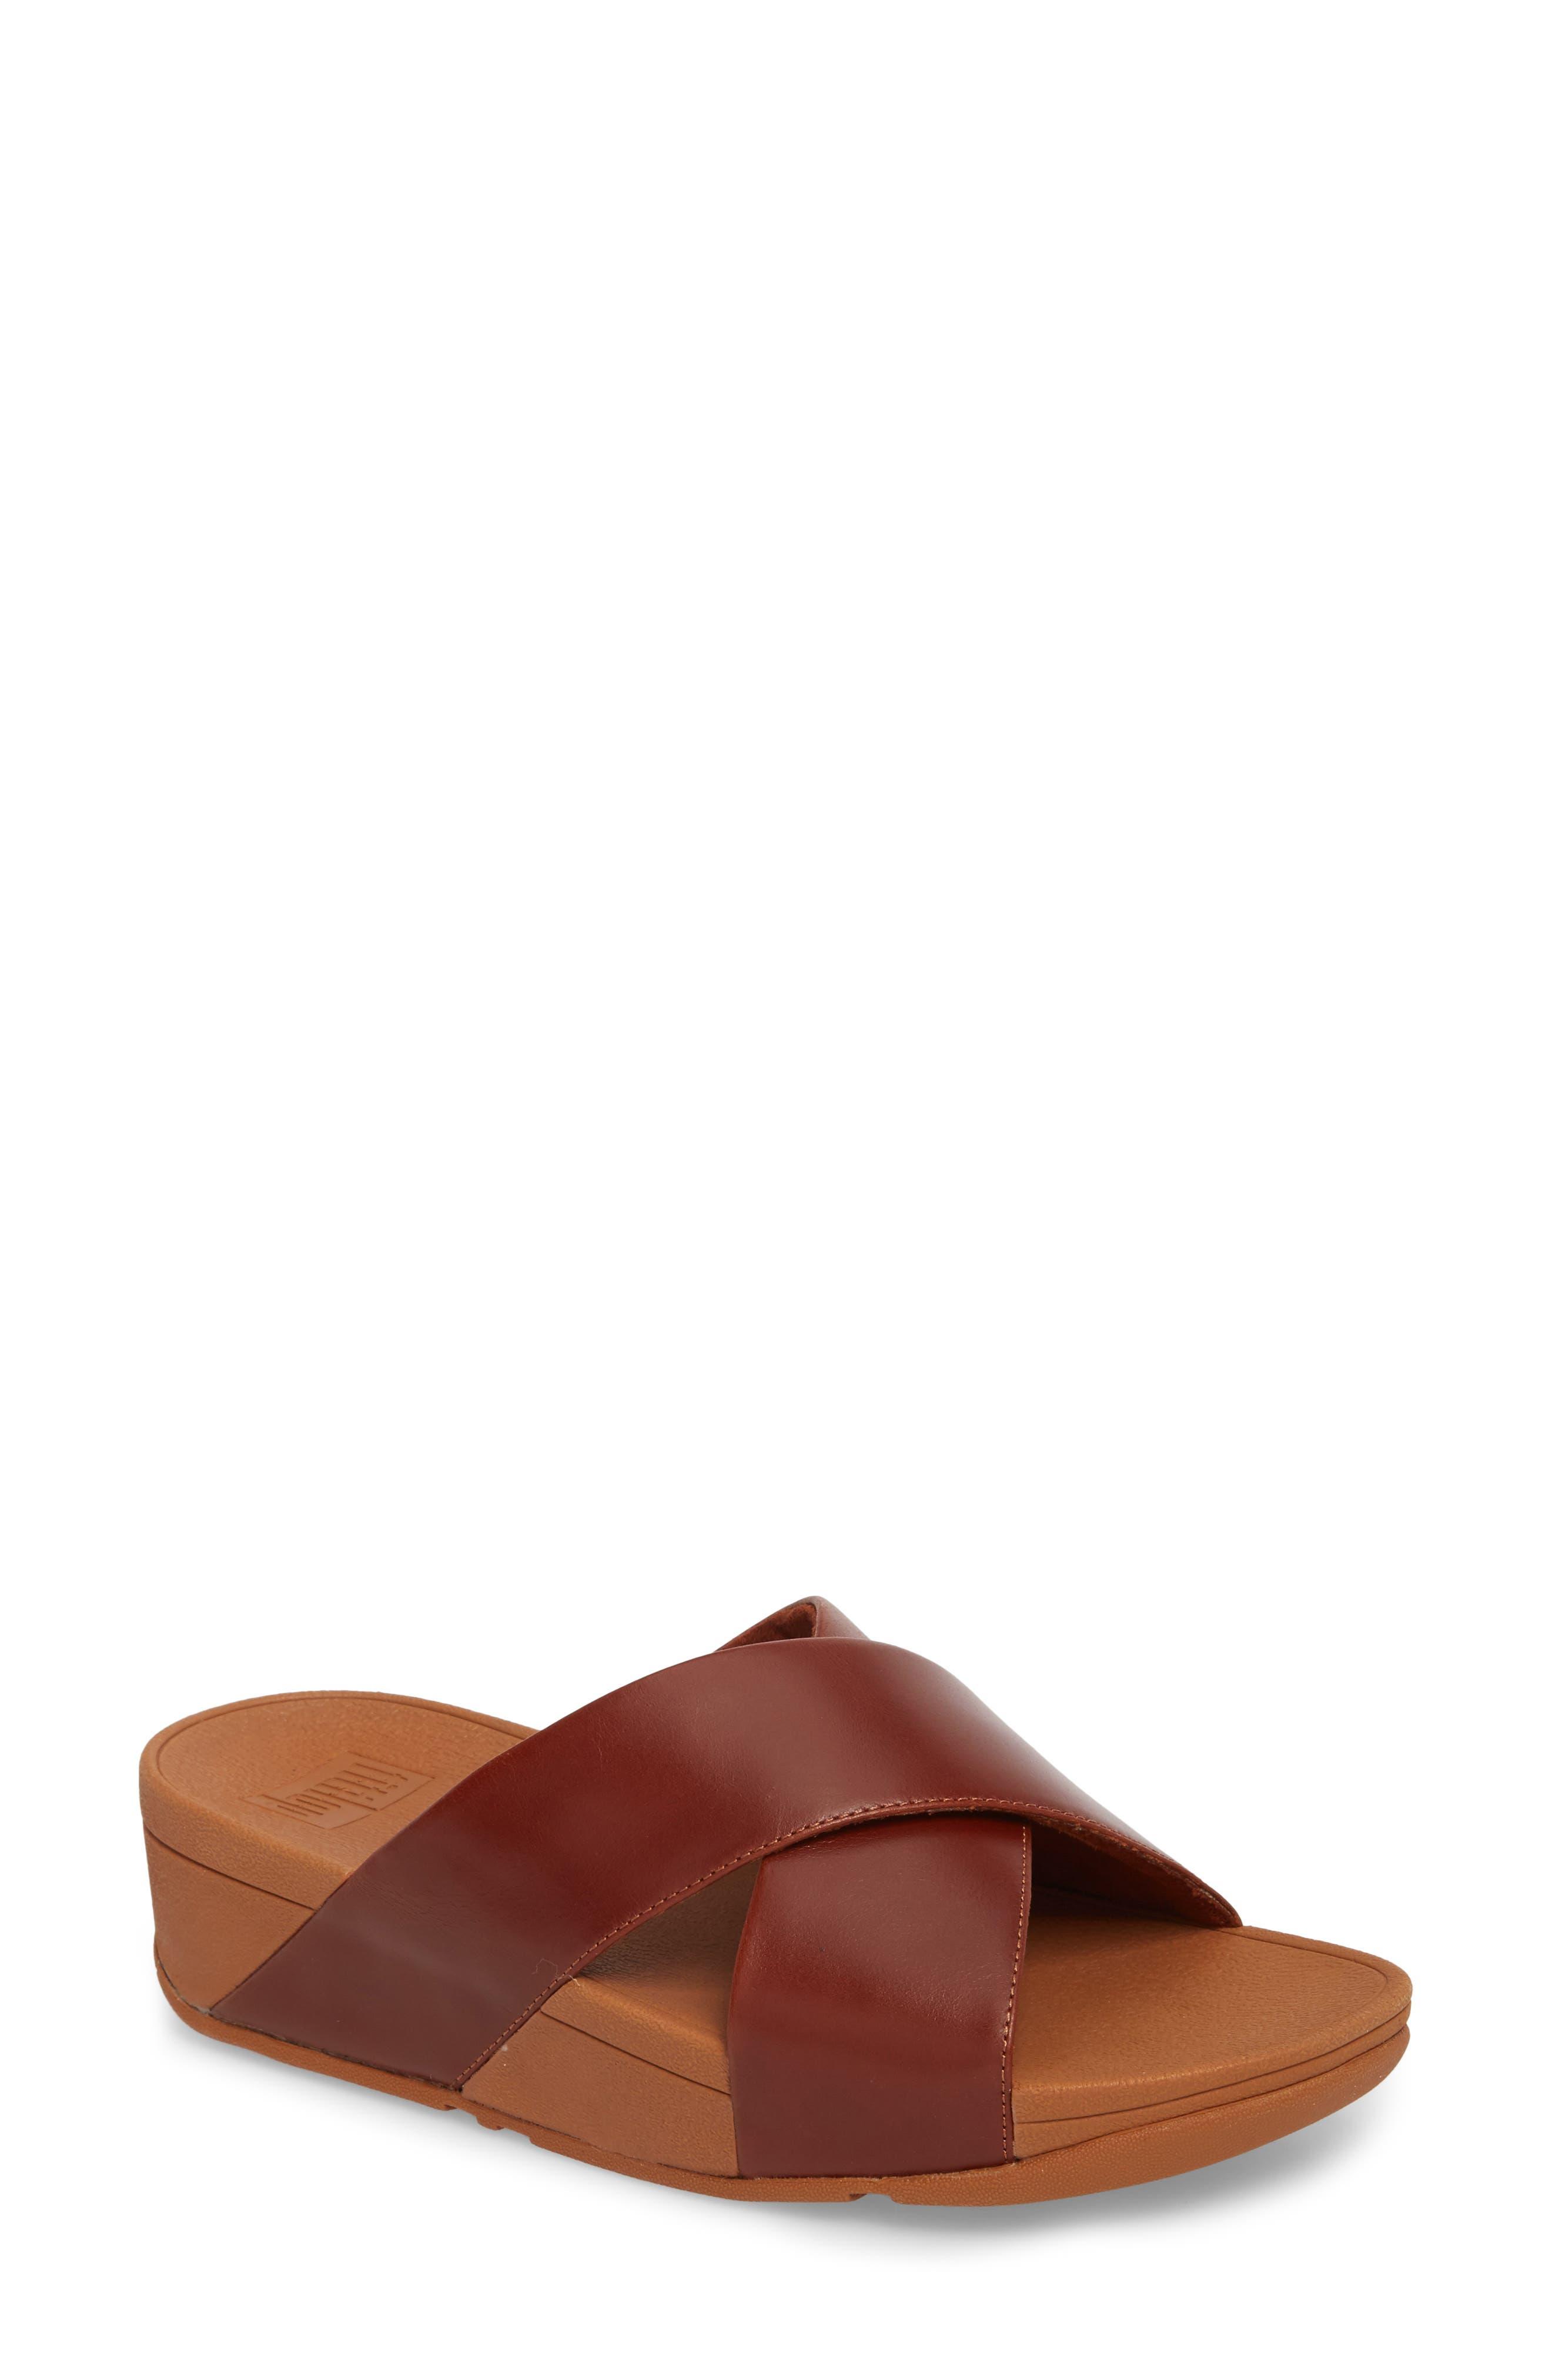 Lulu Cross Slide Sandal,                         Main,                         color, Cognac